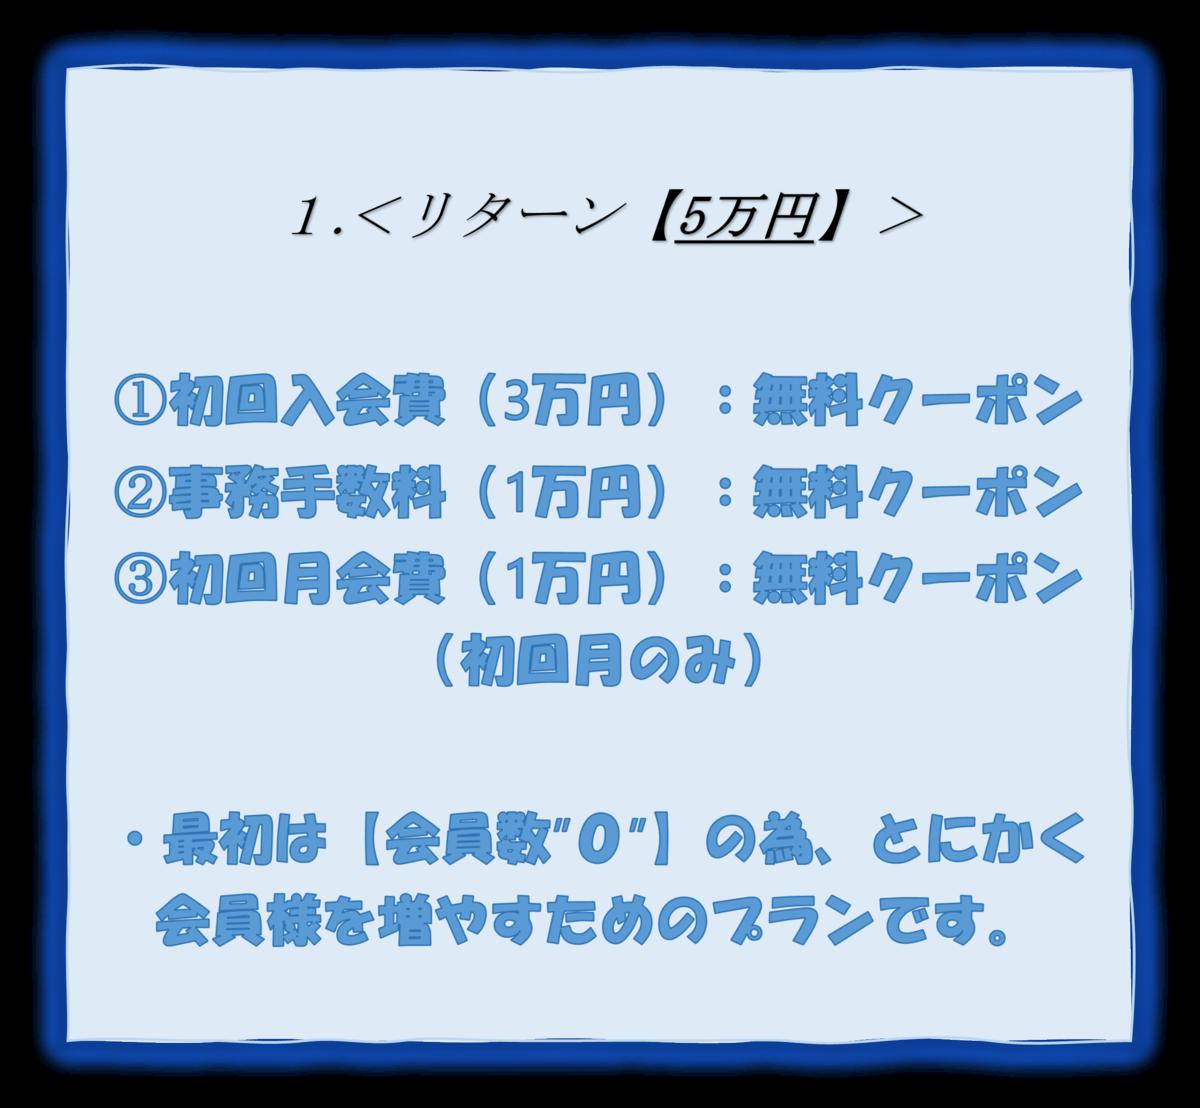 f:id:tsubasatyann:20210424110019p:plain